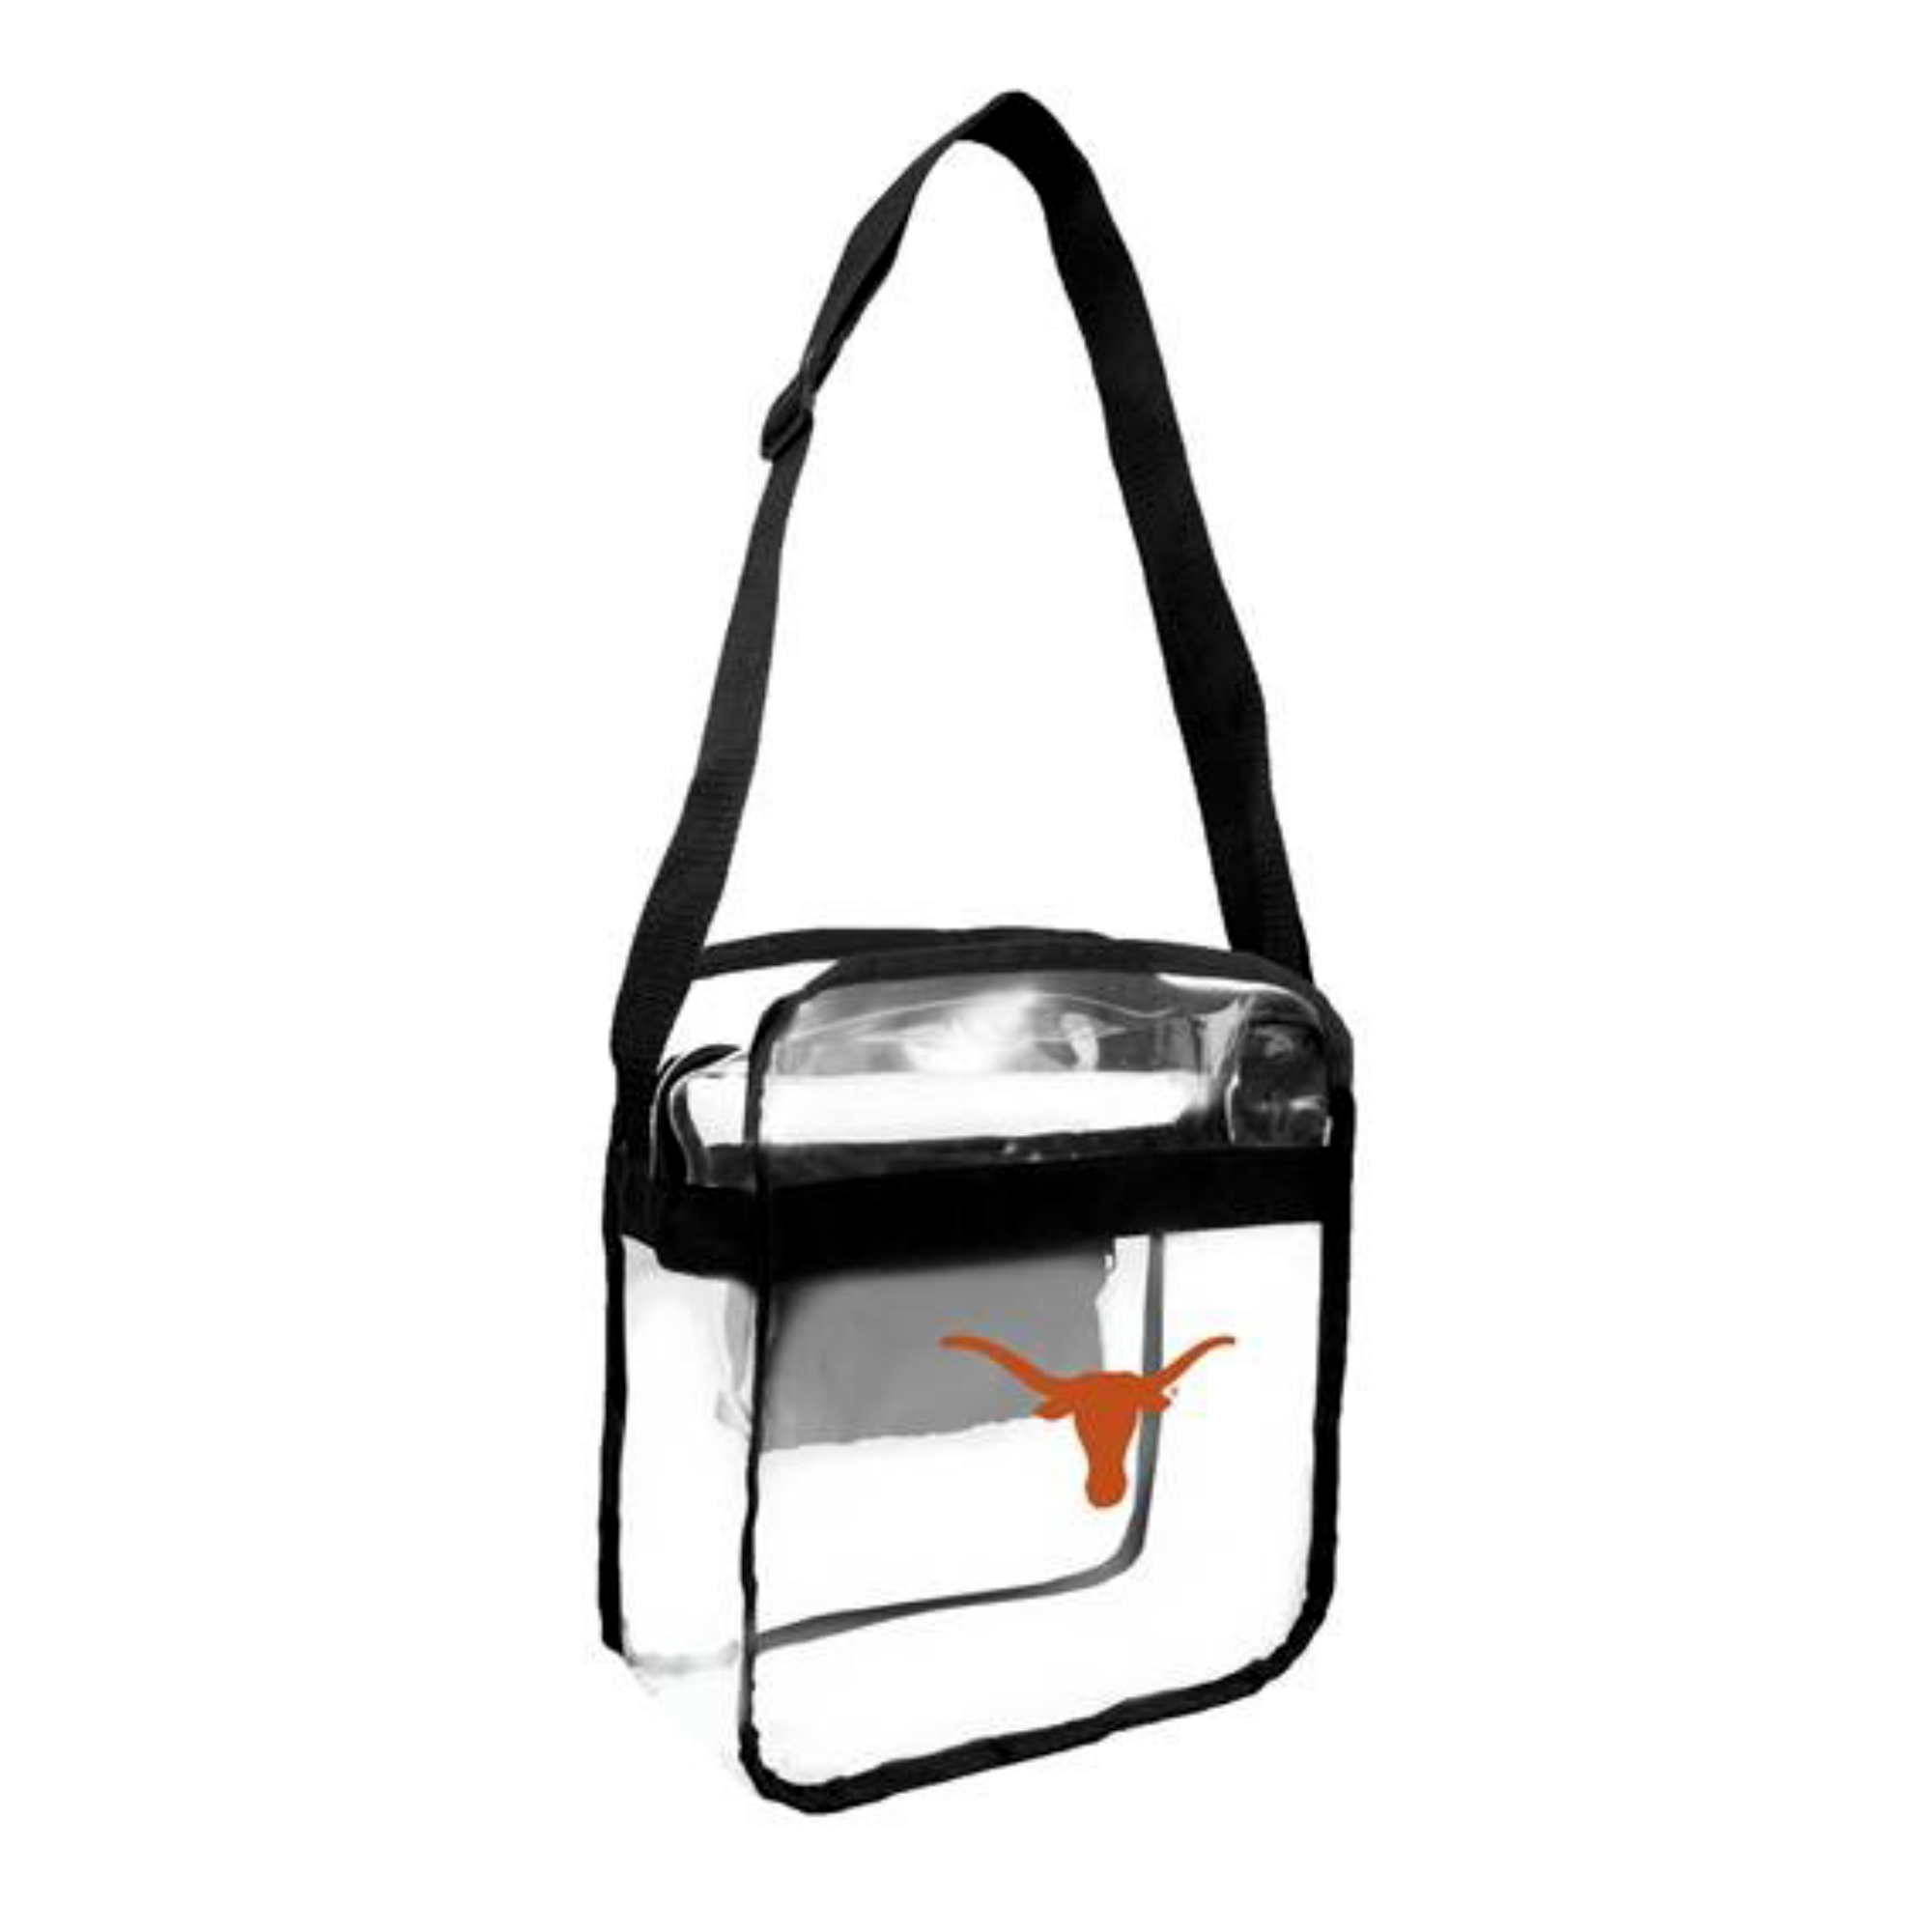 Little Earth - NCAA Clear Carryall Cross Body Bag, University of Texas Longhorns